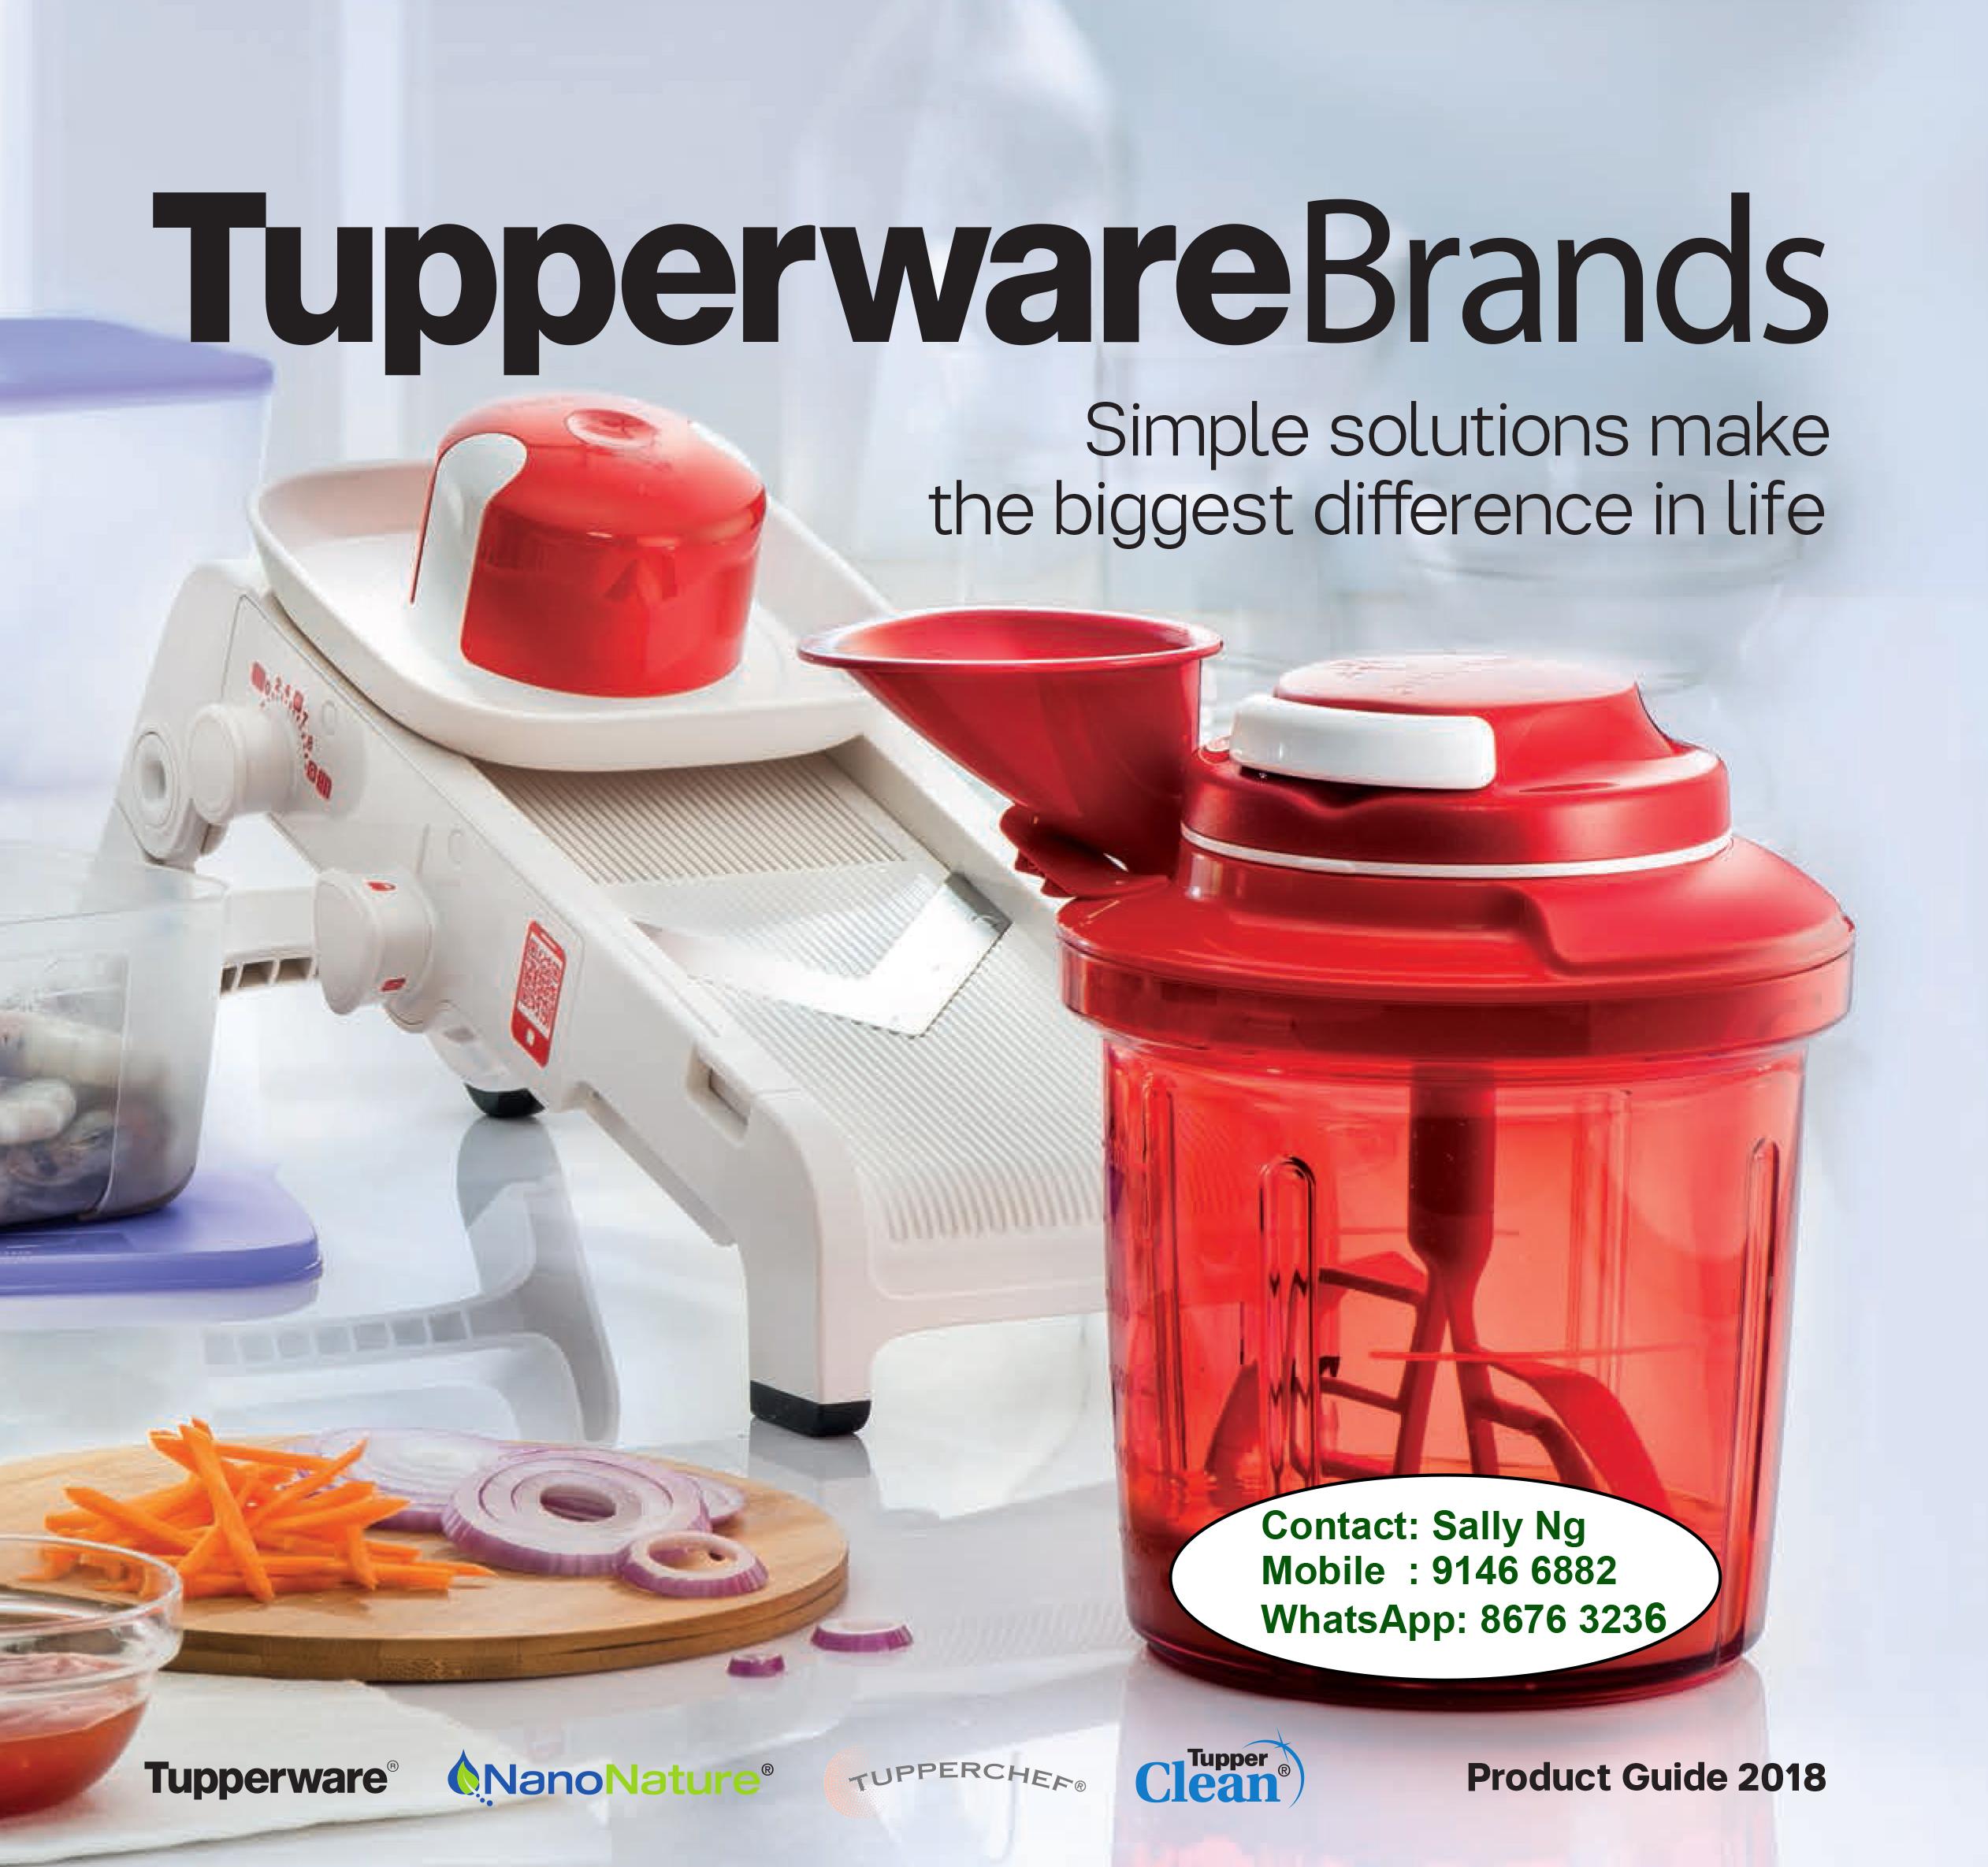 Tupperware Singapore Catalogue 2018   Tupperware Brands